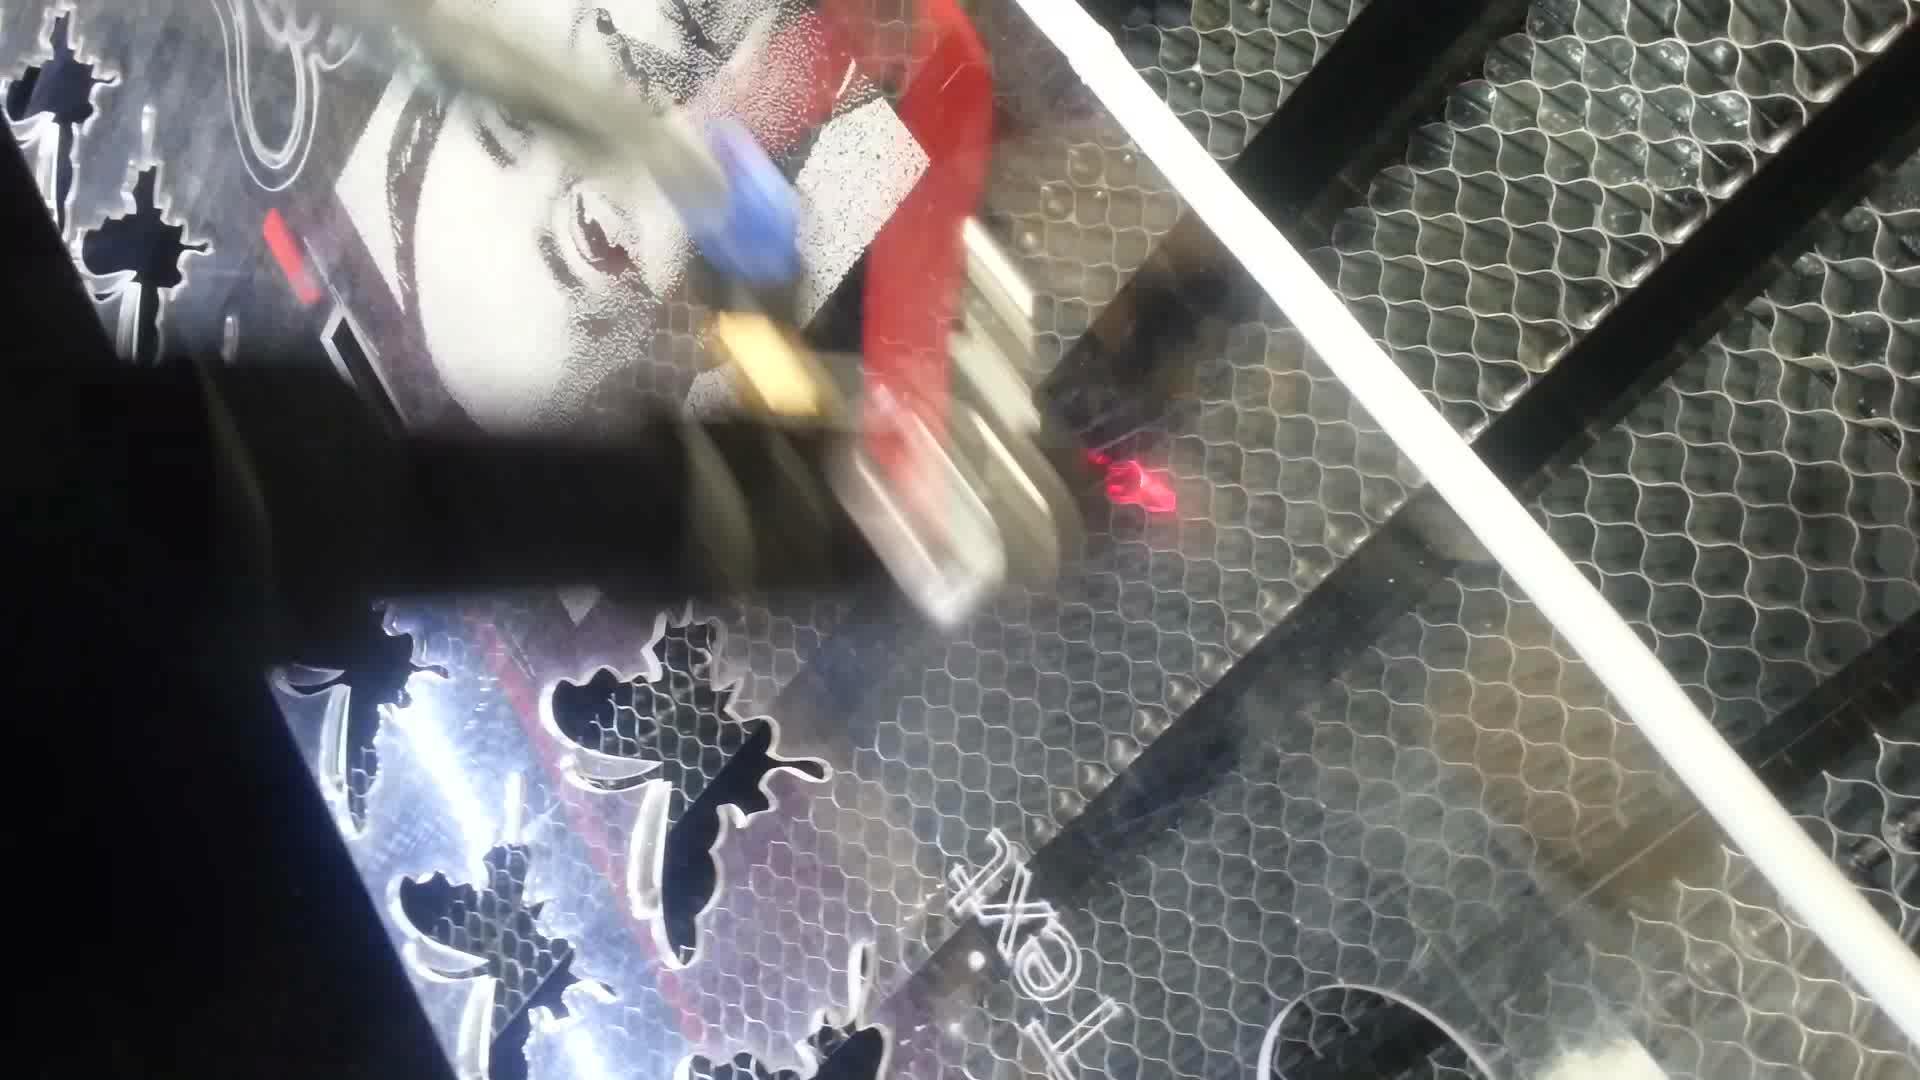 Jinan CO2 1390 laser snijmachine cutter prijs voor acryl graveermachine 60 w 80 w 100 w 150 w